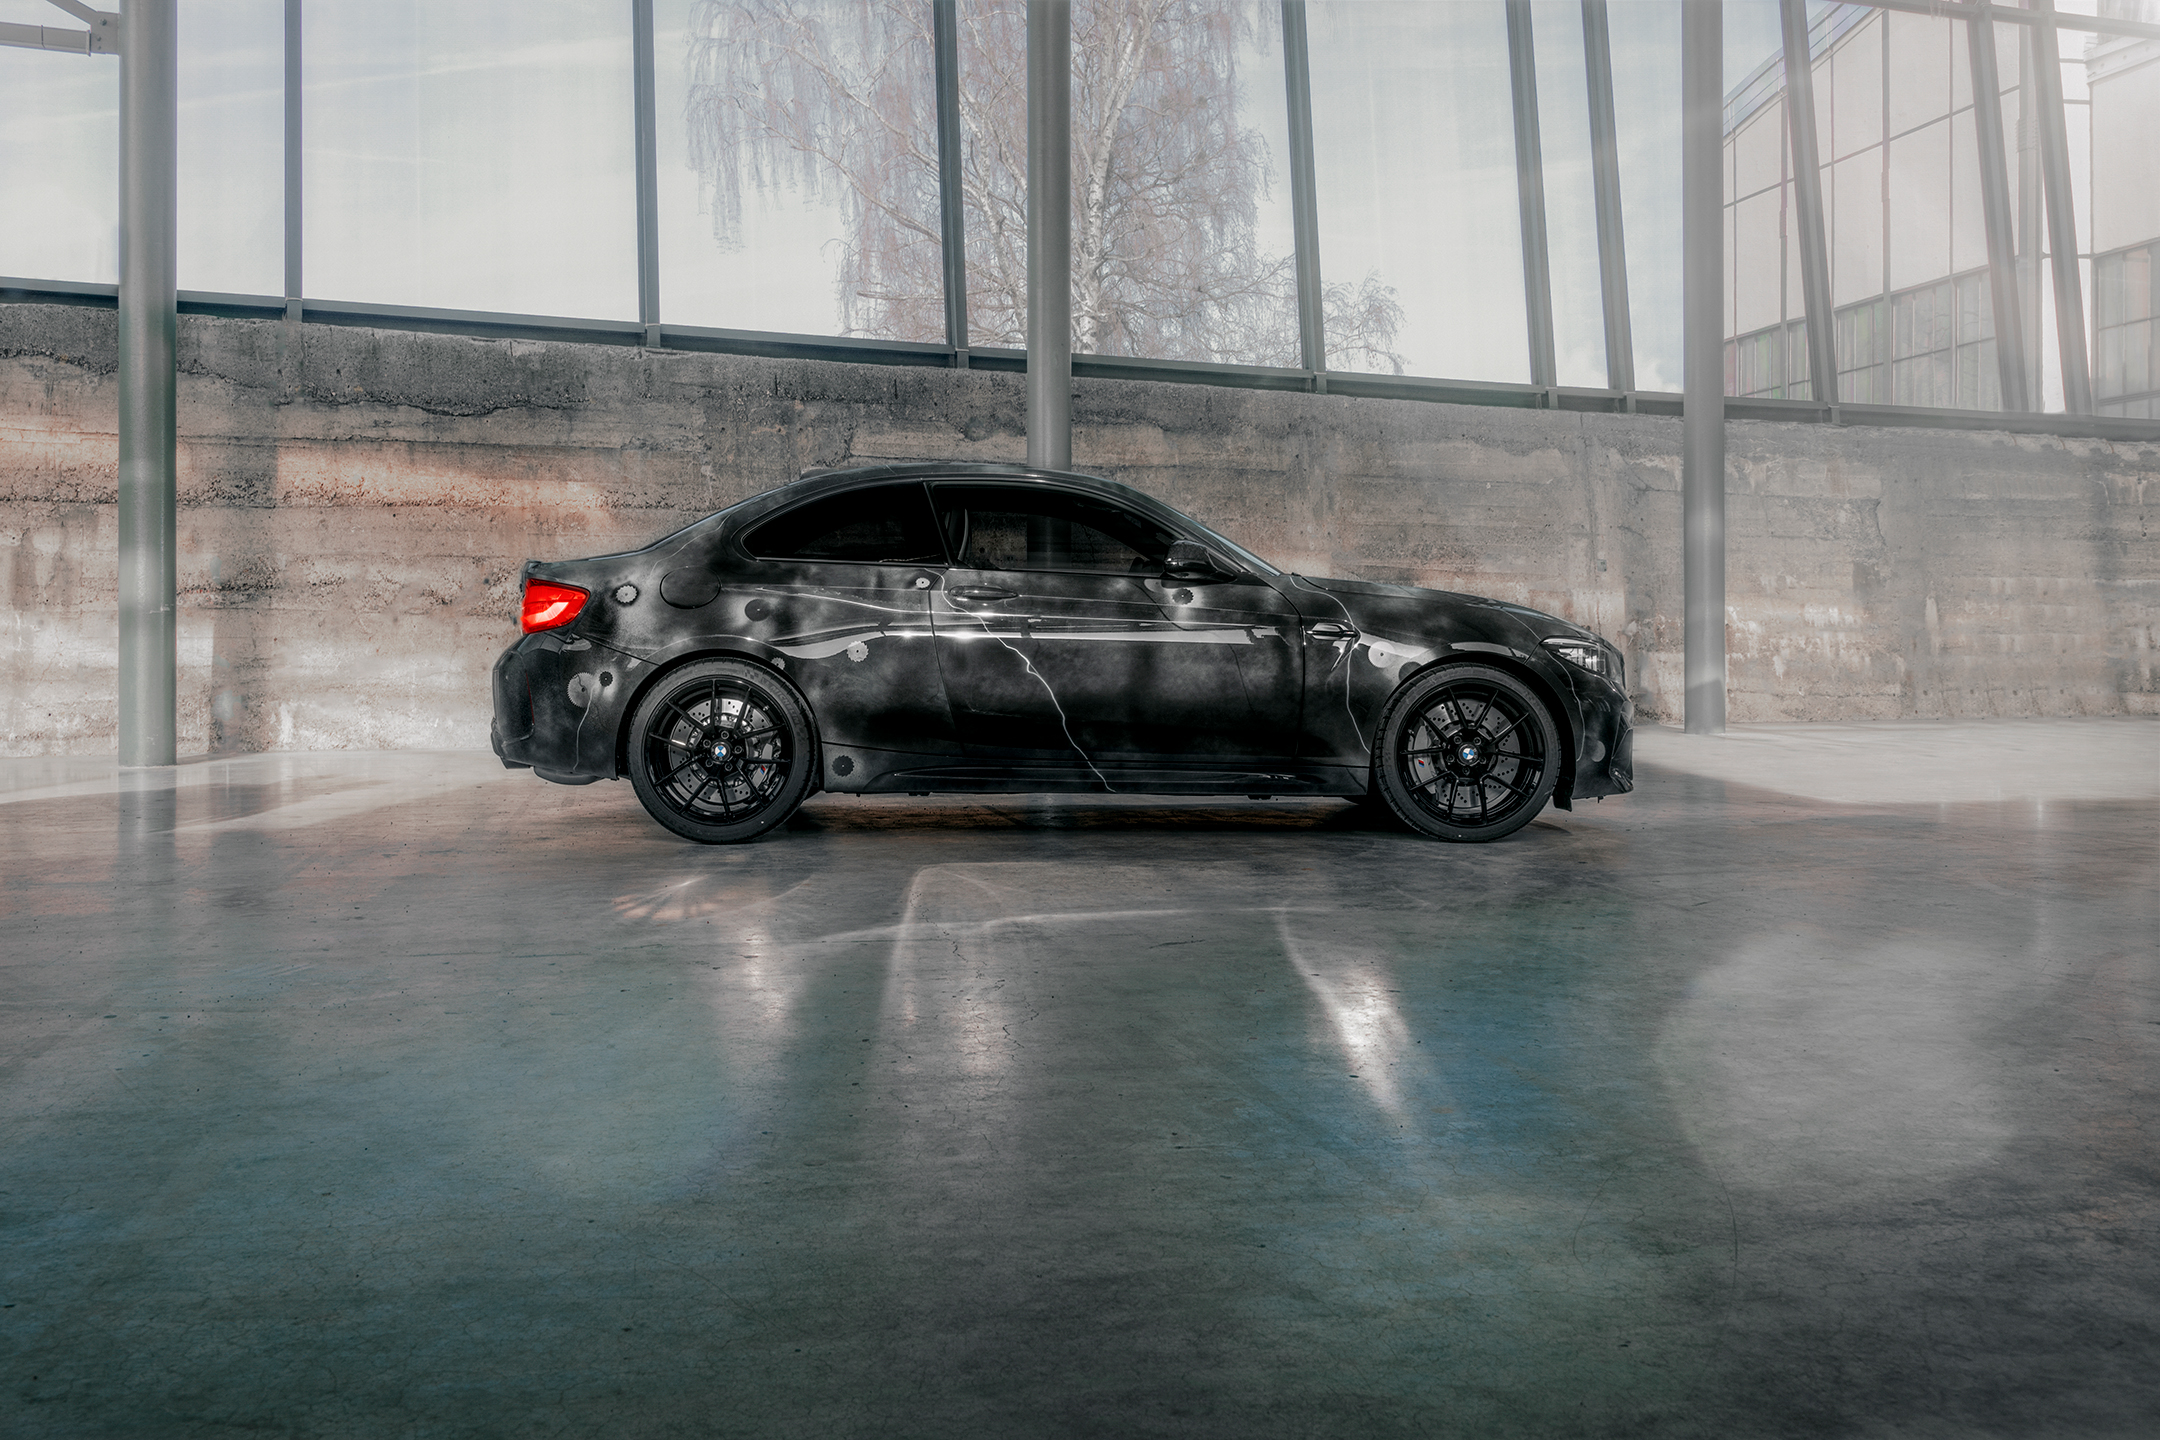 BMW M2 by FUTURA 2000 - Street Art Car - 2020 - side-face / profil